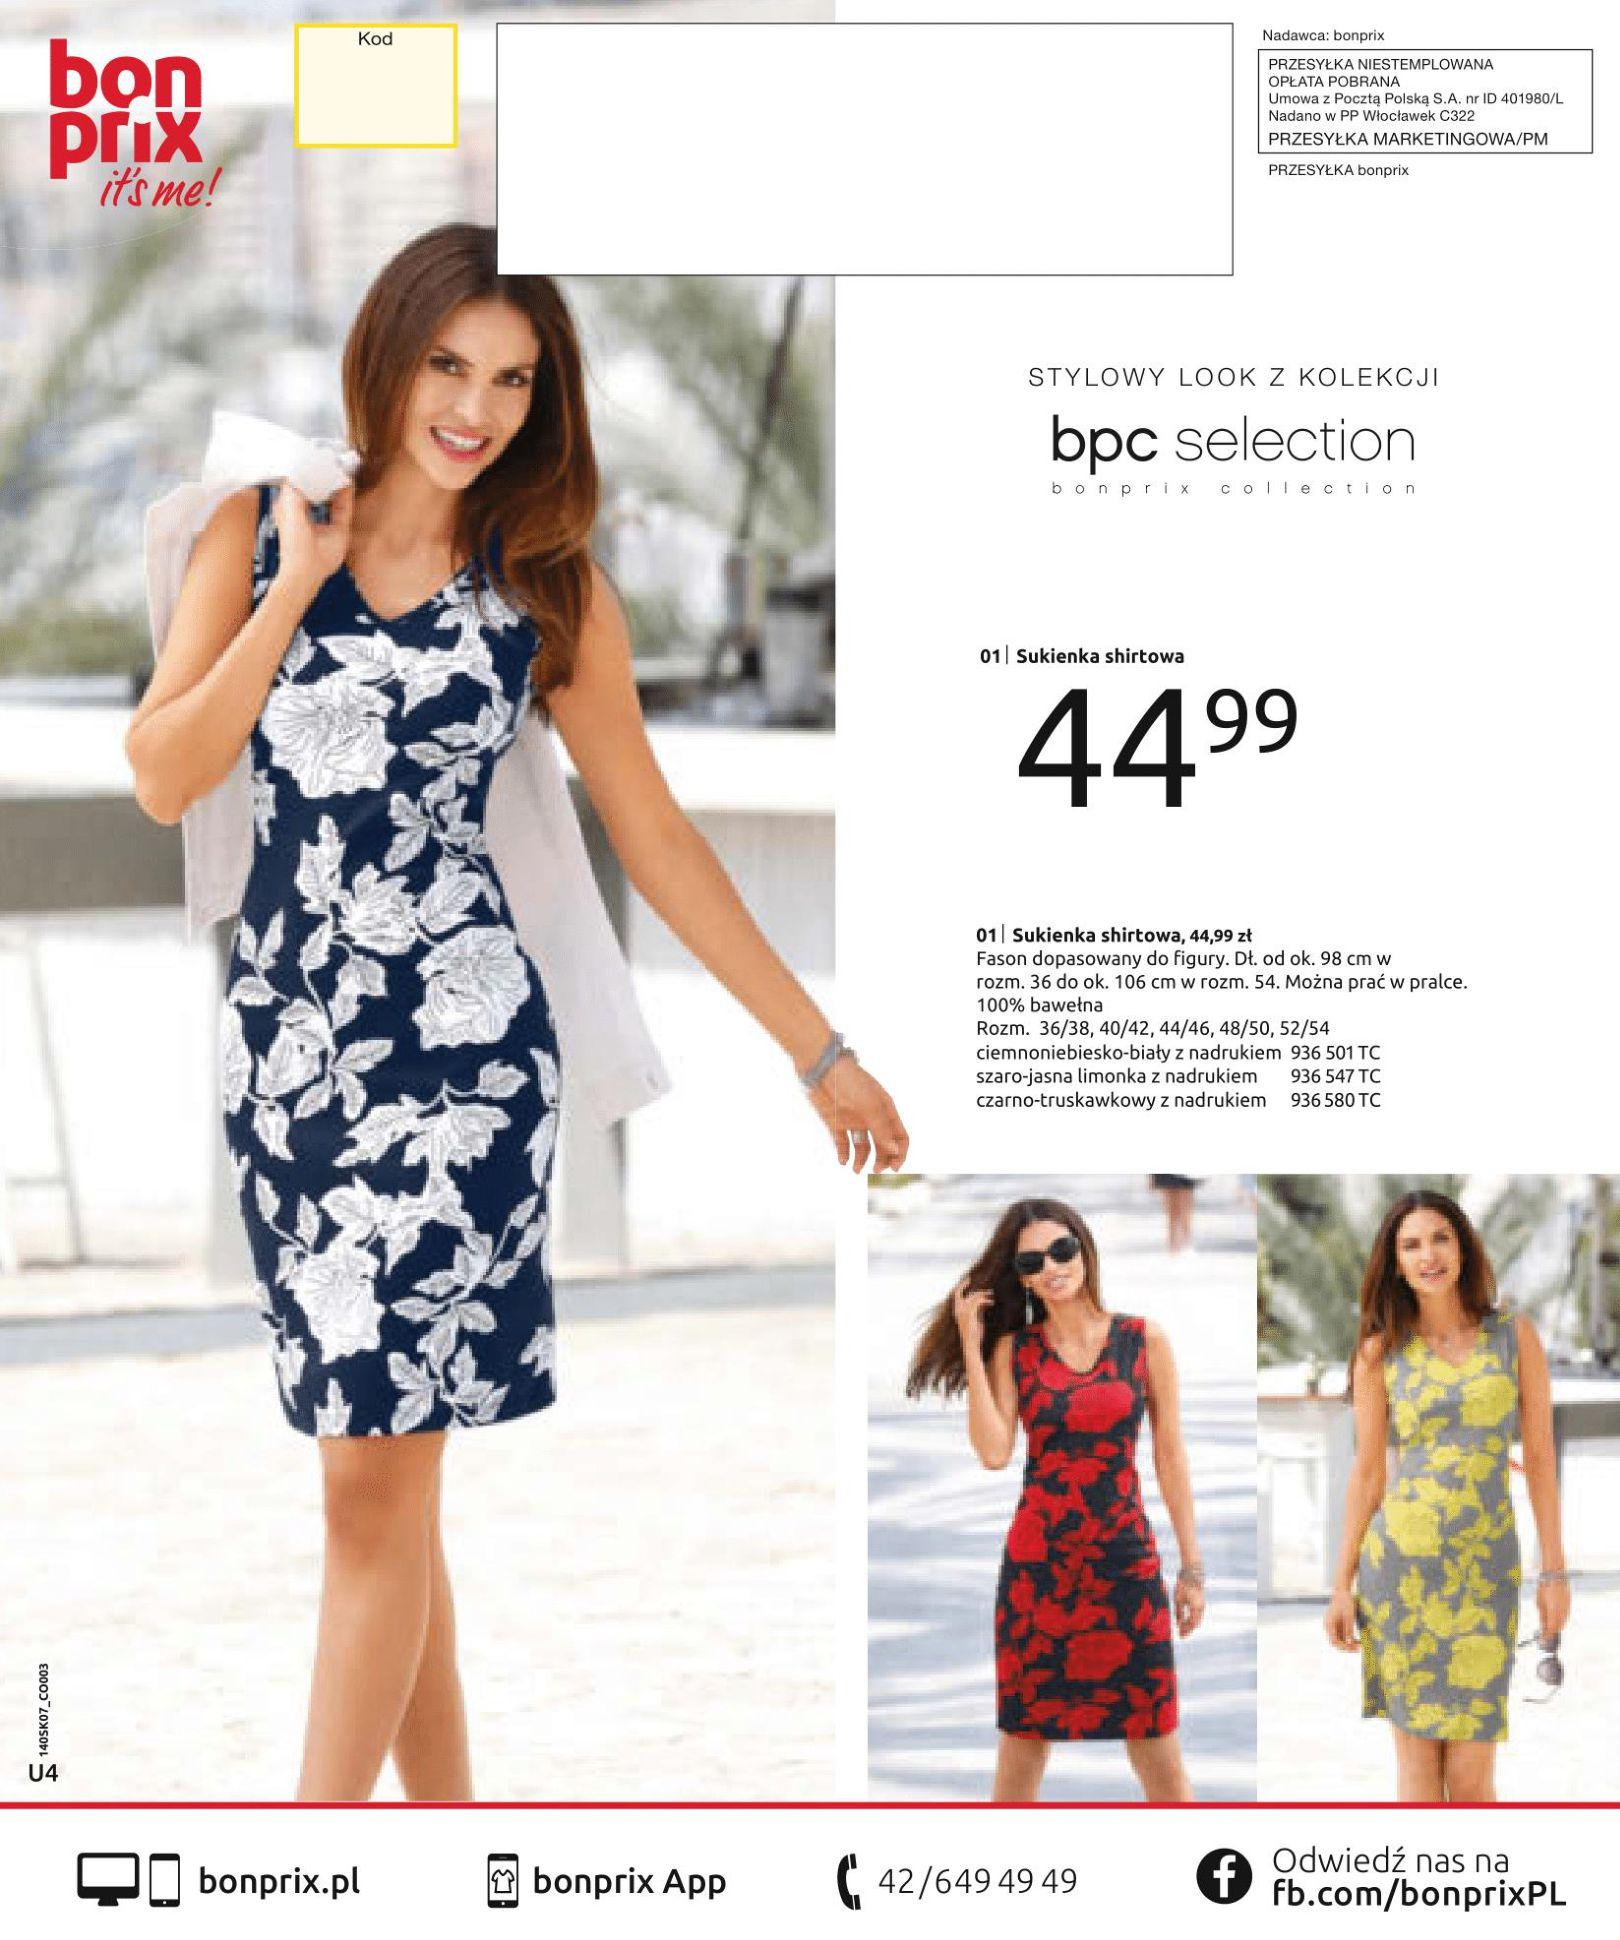 Gazetka Bonprix - Letnie trendy-02.07.2019-15.01.2020-page-76